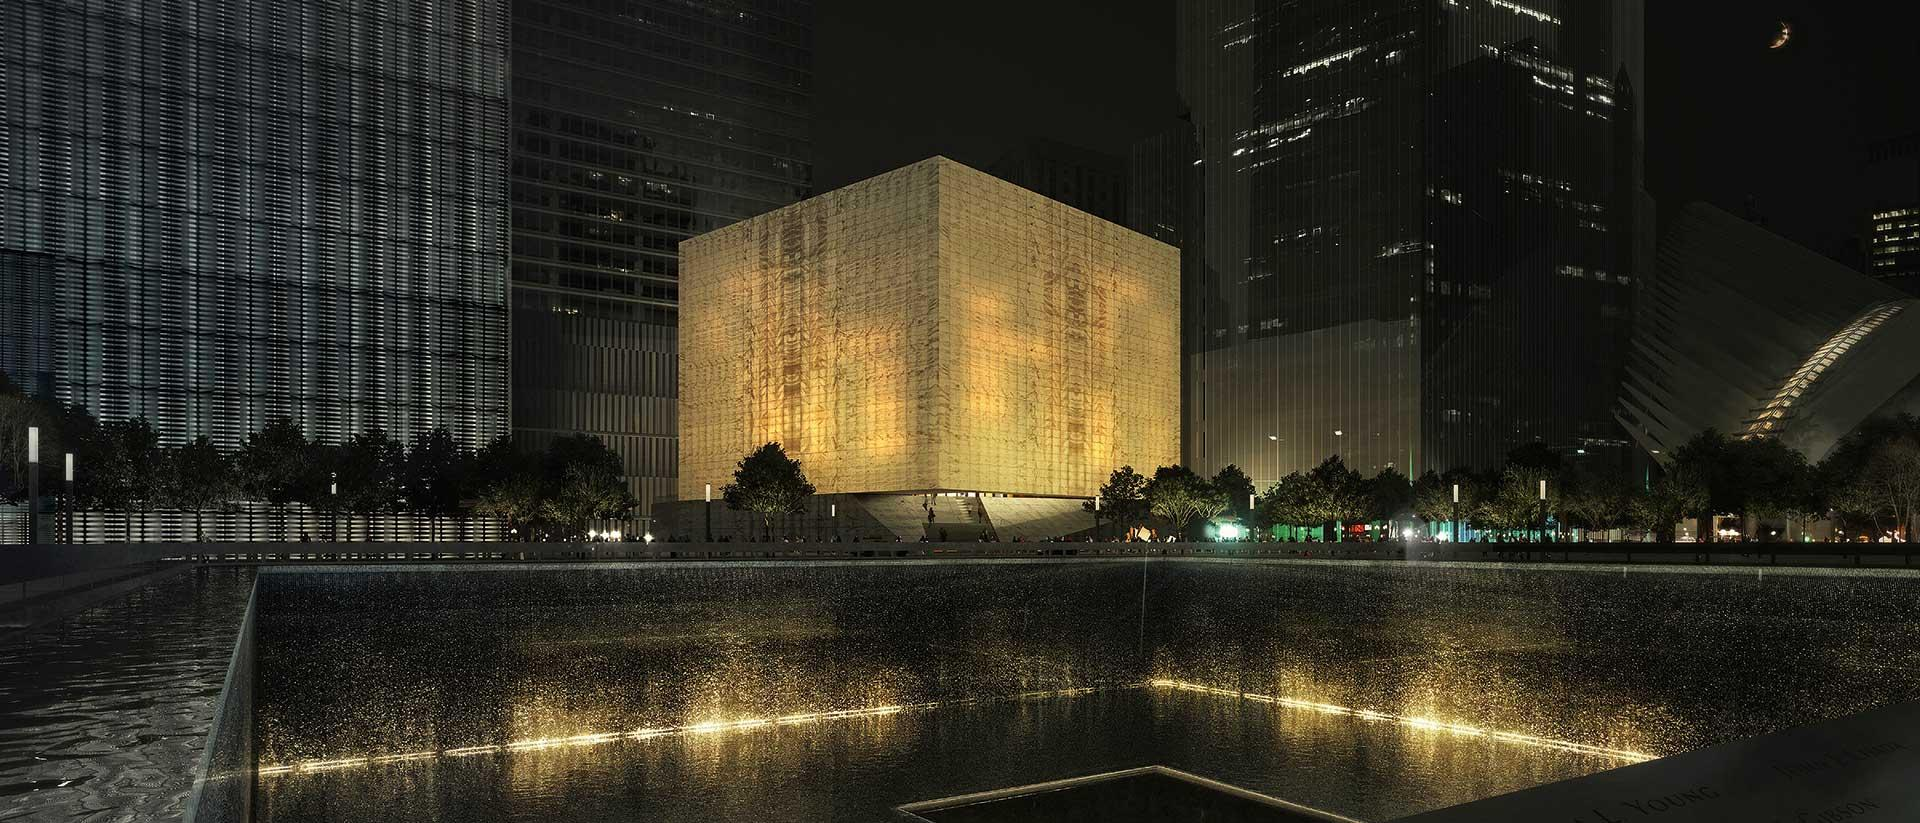 The Perelman Center Project Cover